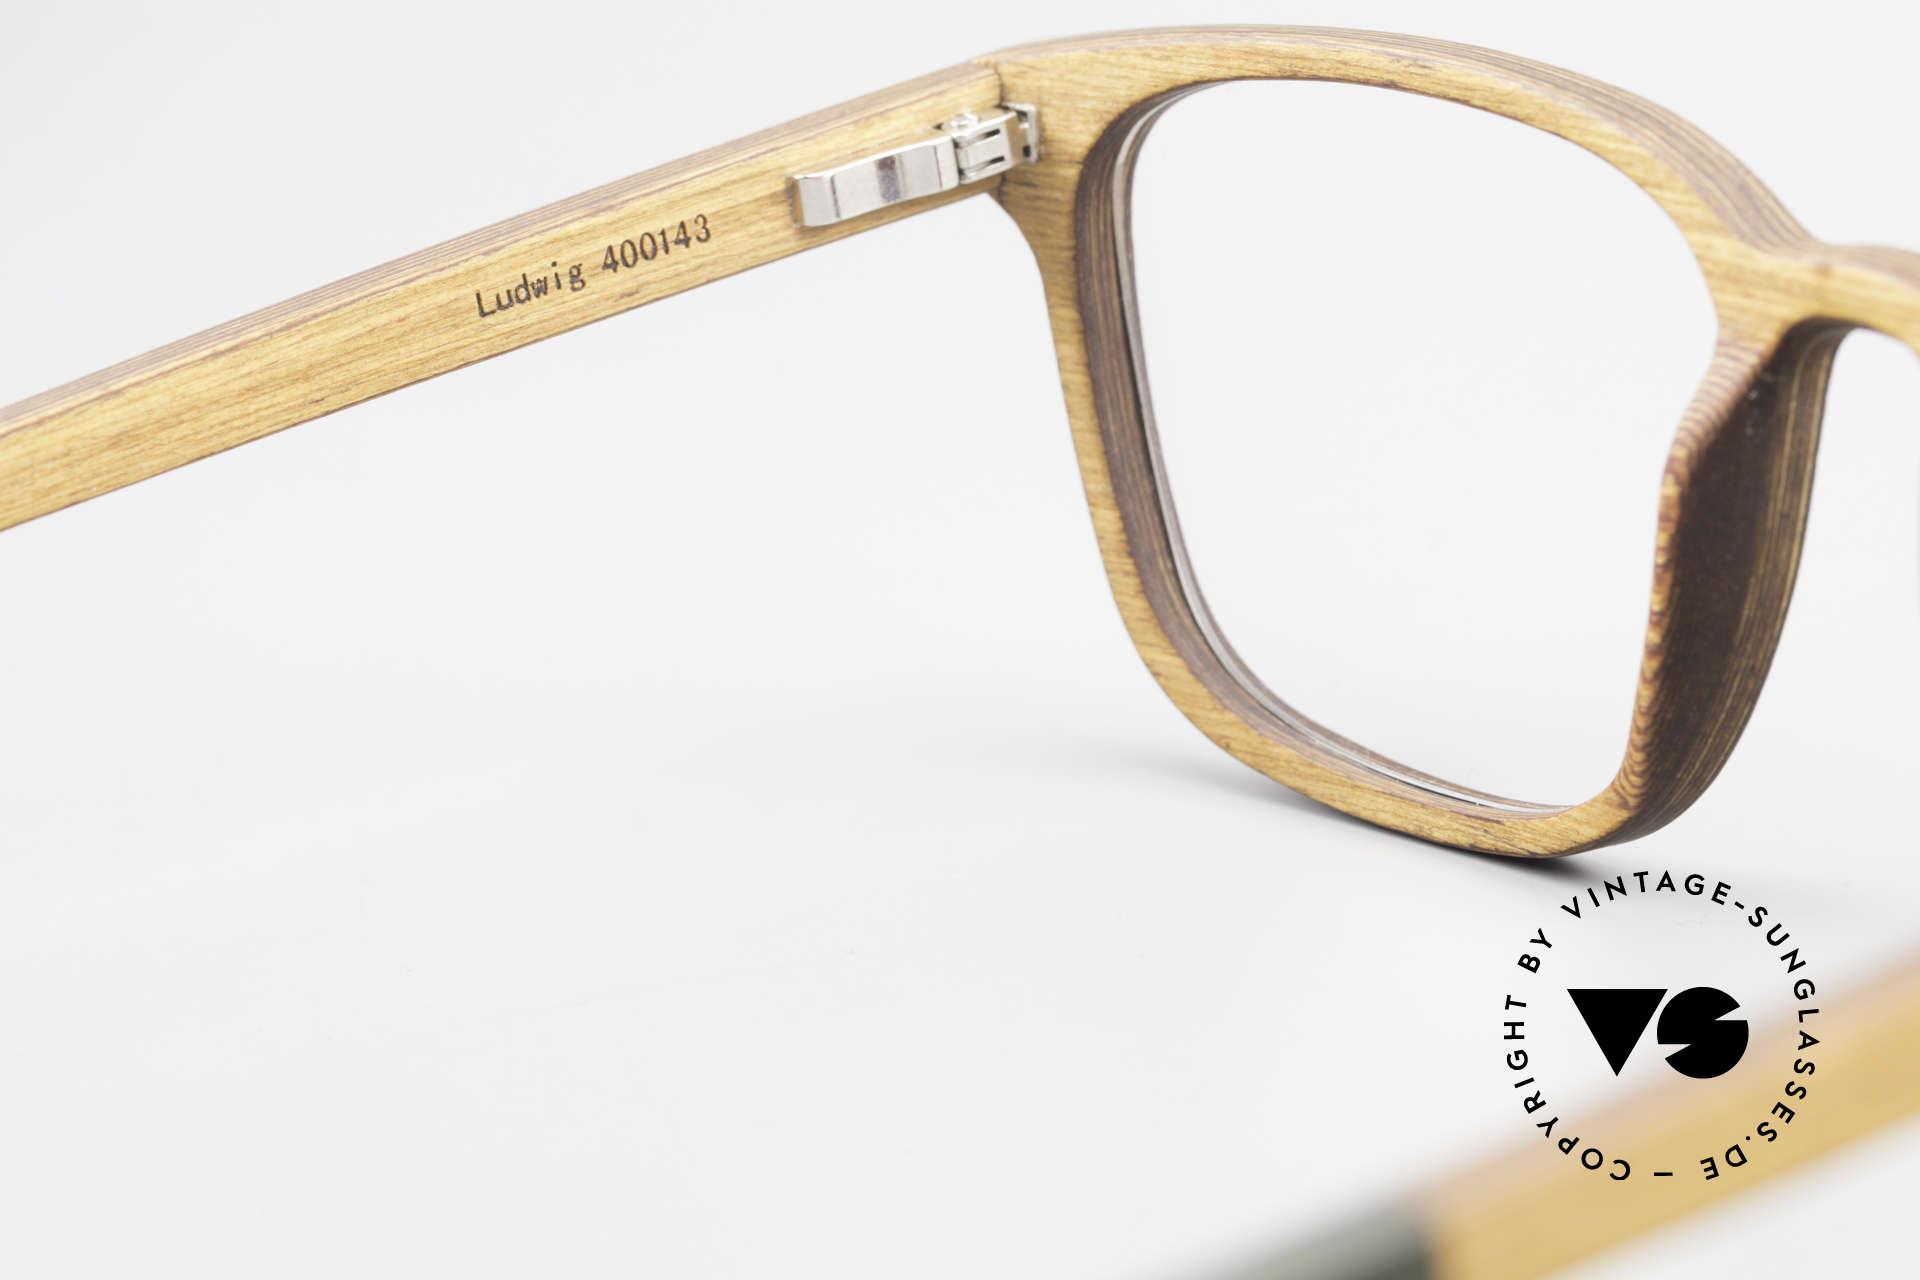 Kerbholz Ludwig Holzbrille Herren Erlenholz, ungetragenes Exemplar, mit flexiblen Federscharnieren, Passend für Herren